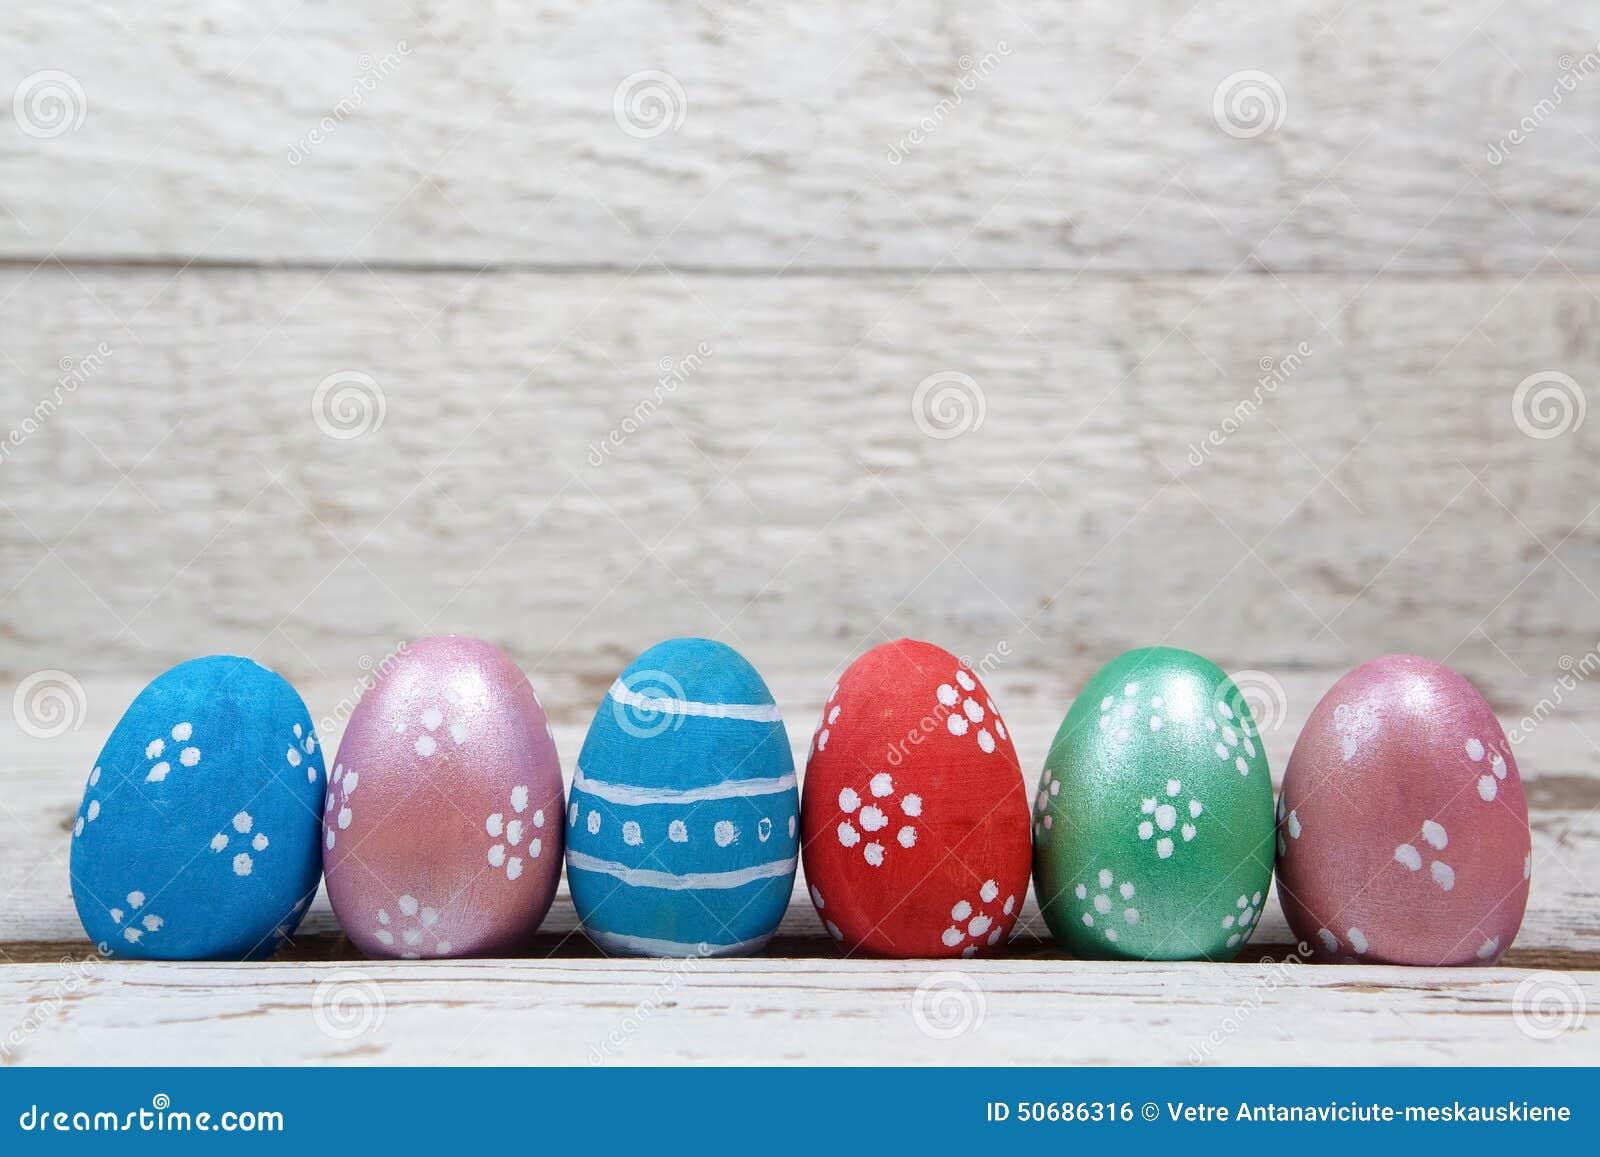 Download 复活节装饰 怂恿木头 库存照片. 图片 包括有 节假日, 鸡蛋, 愉快, 食物, 抽象, 五颜六色, 背包 - 50686316